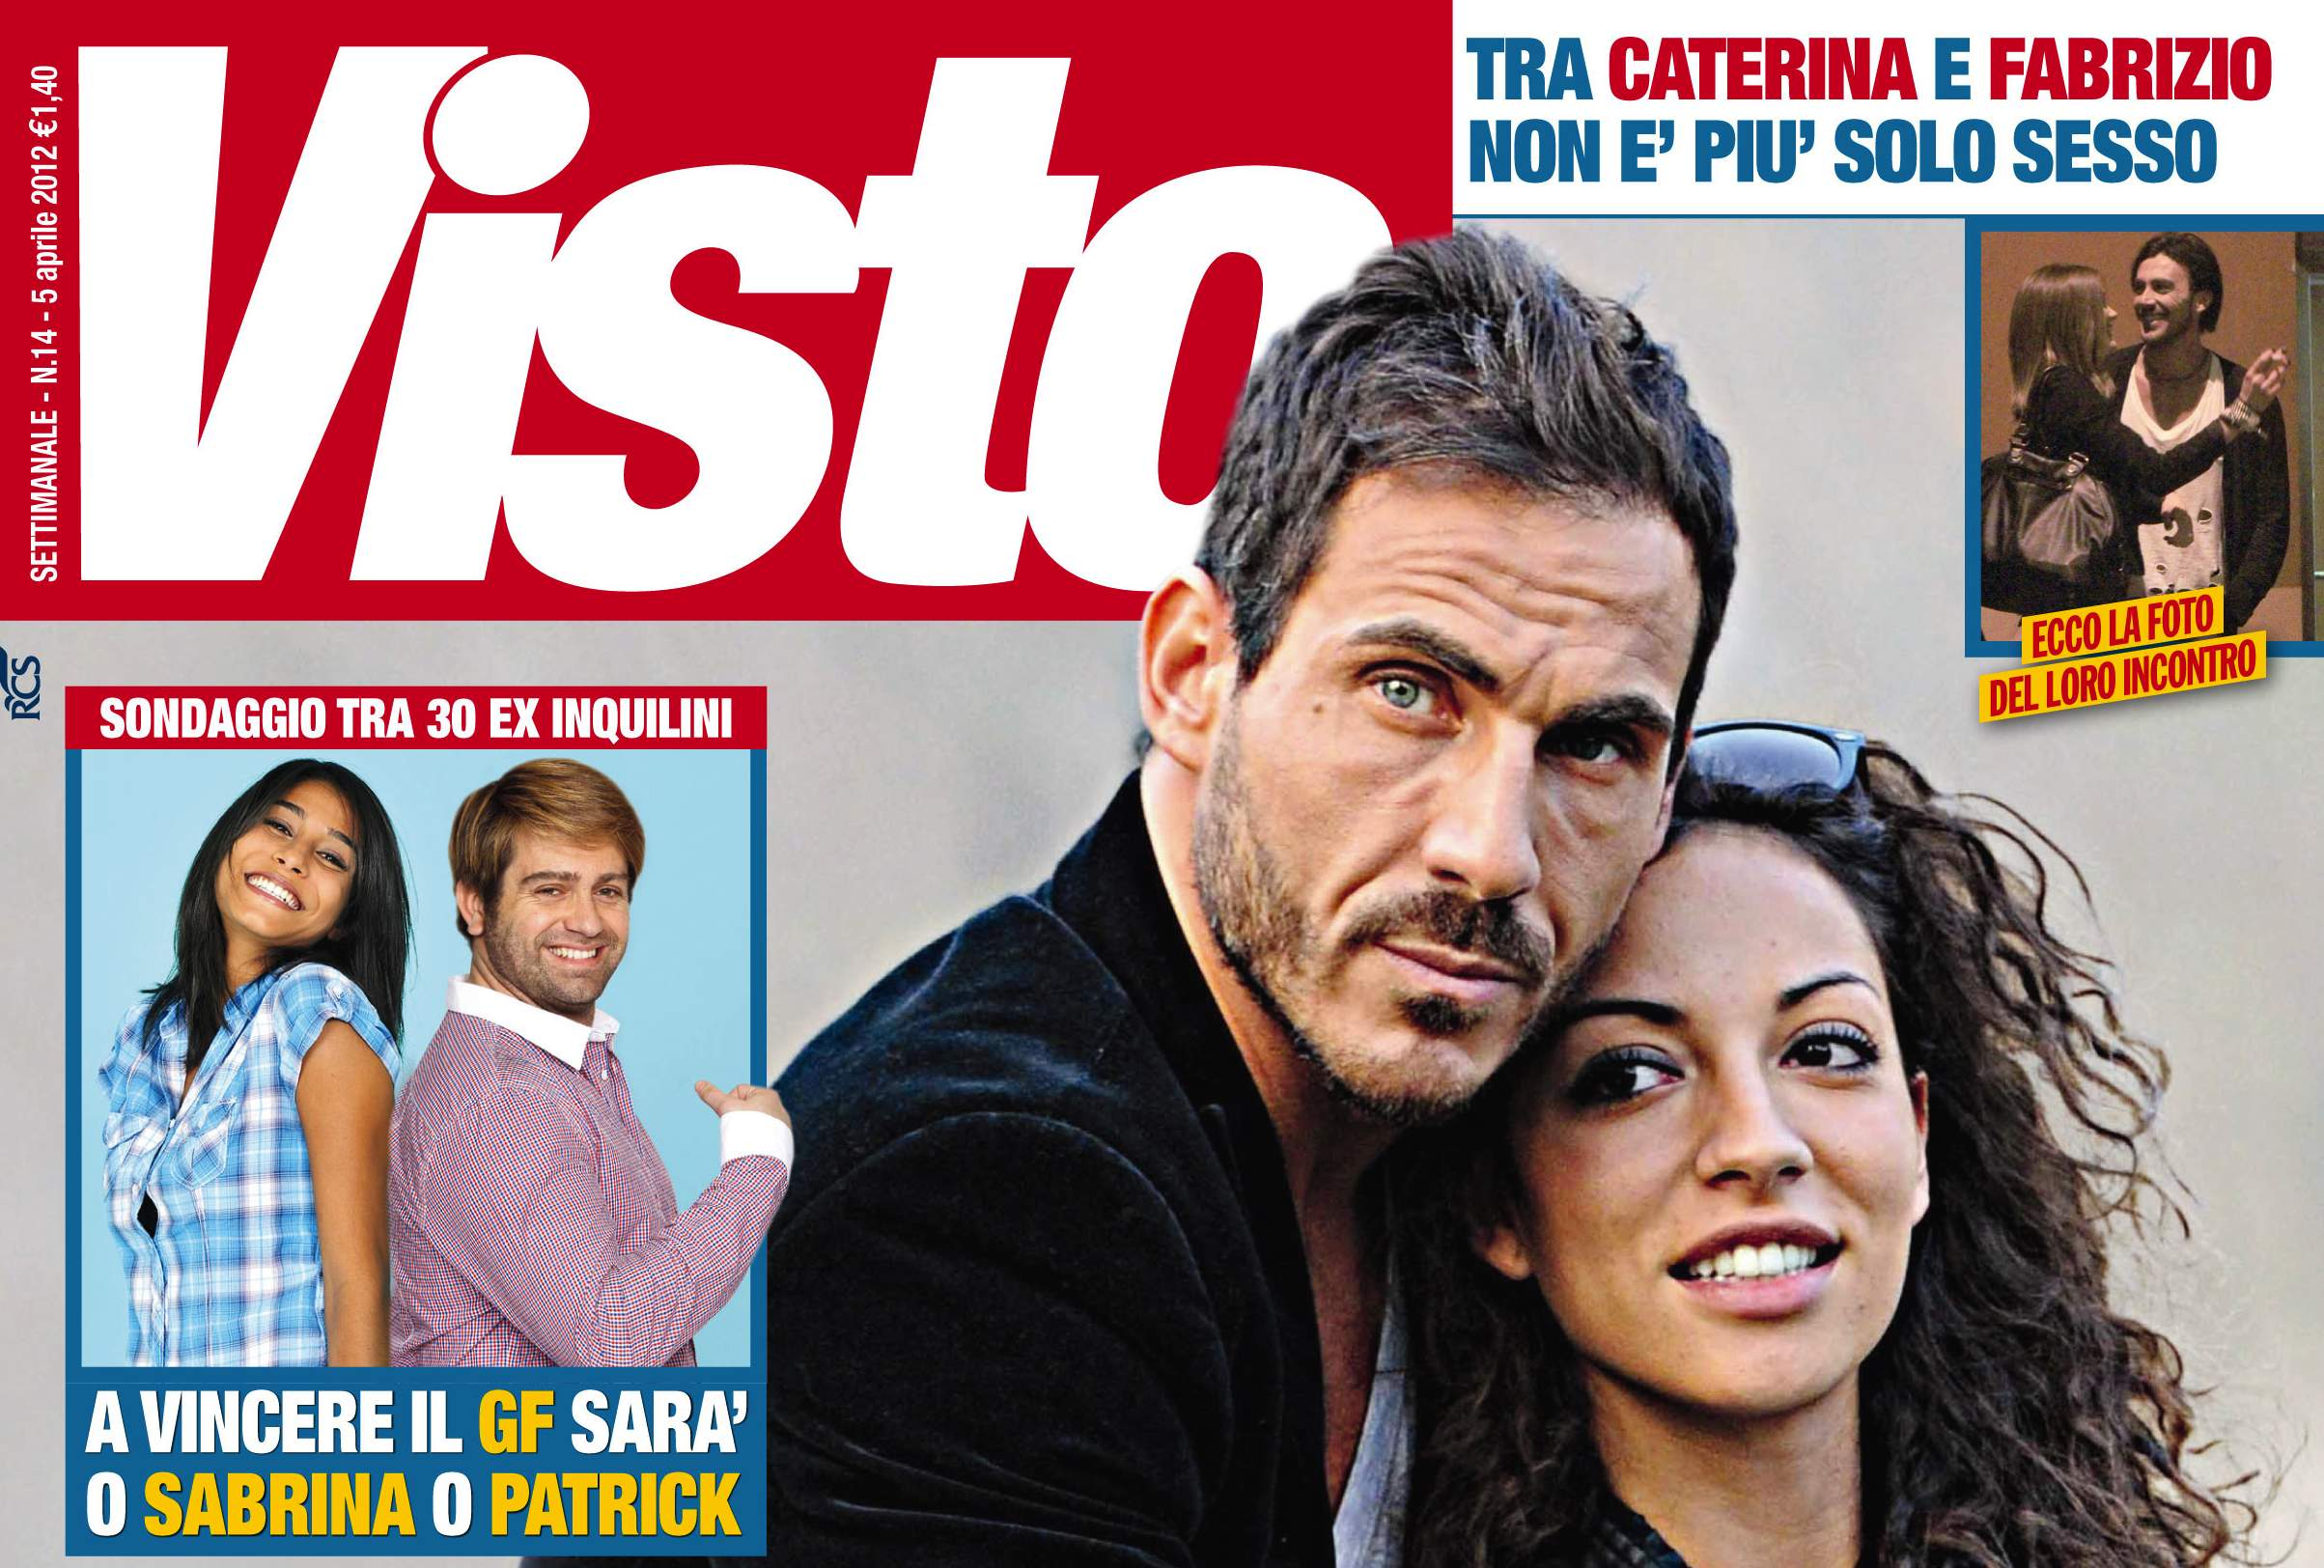 Grande Fratello 12, nasce l'amore fra Caterina e Fabrizio? Mentre fra Enrica e Luca…